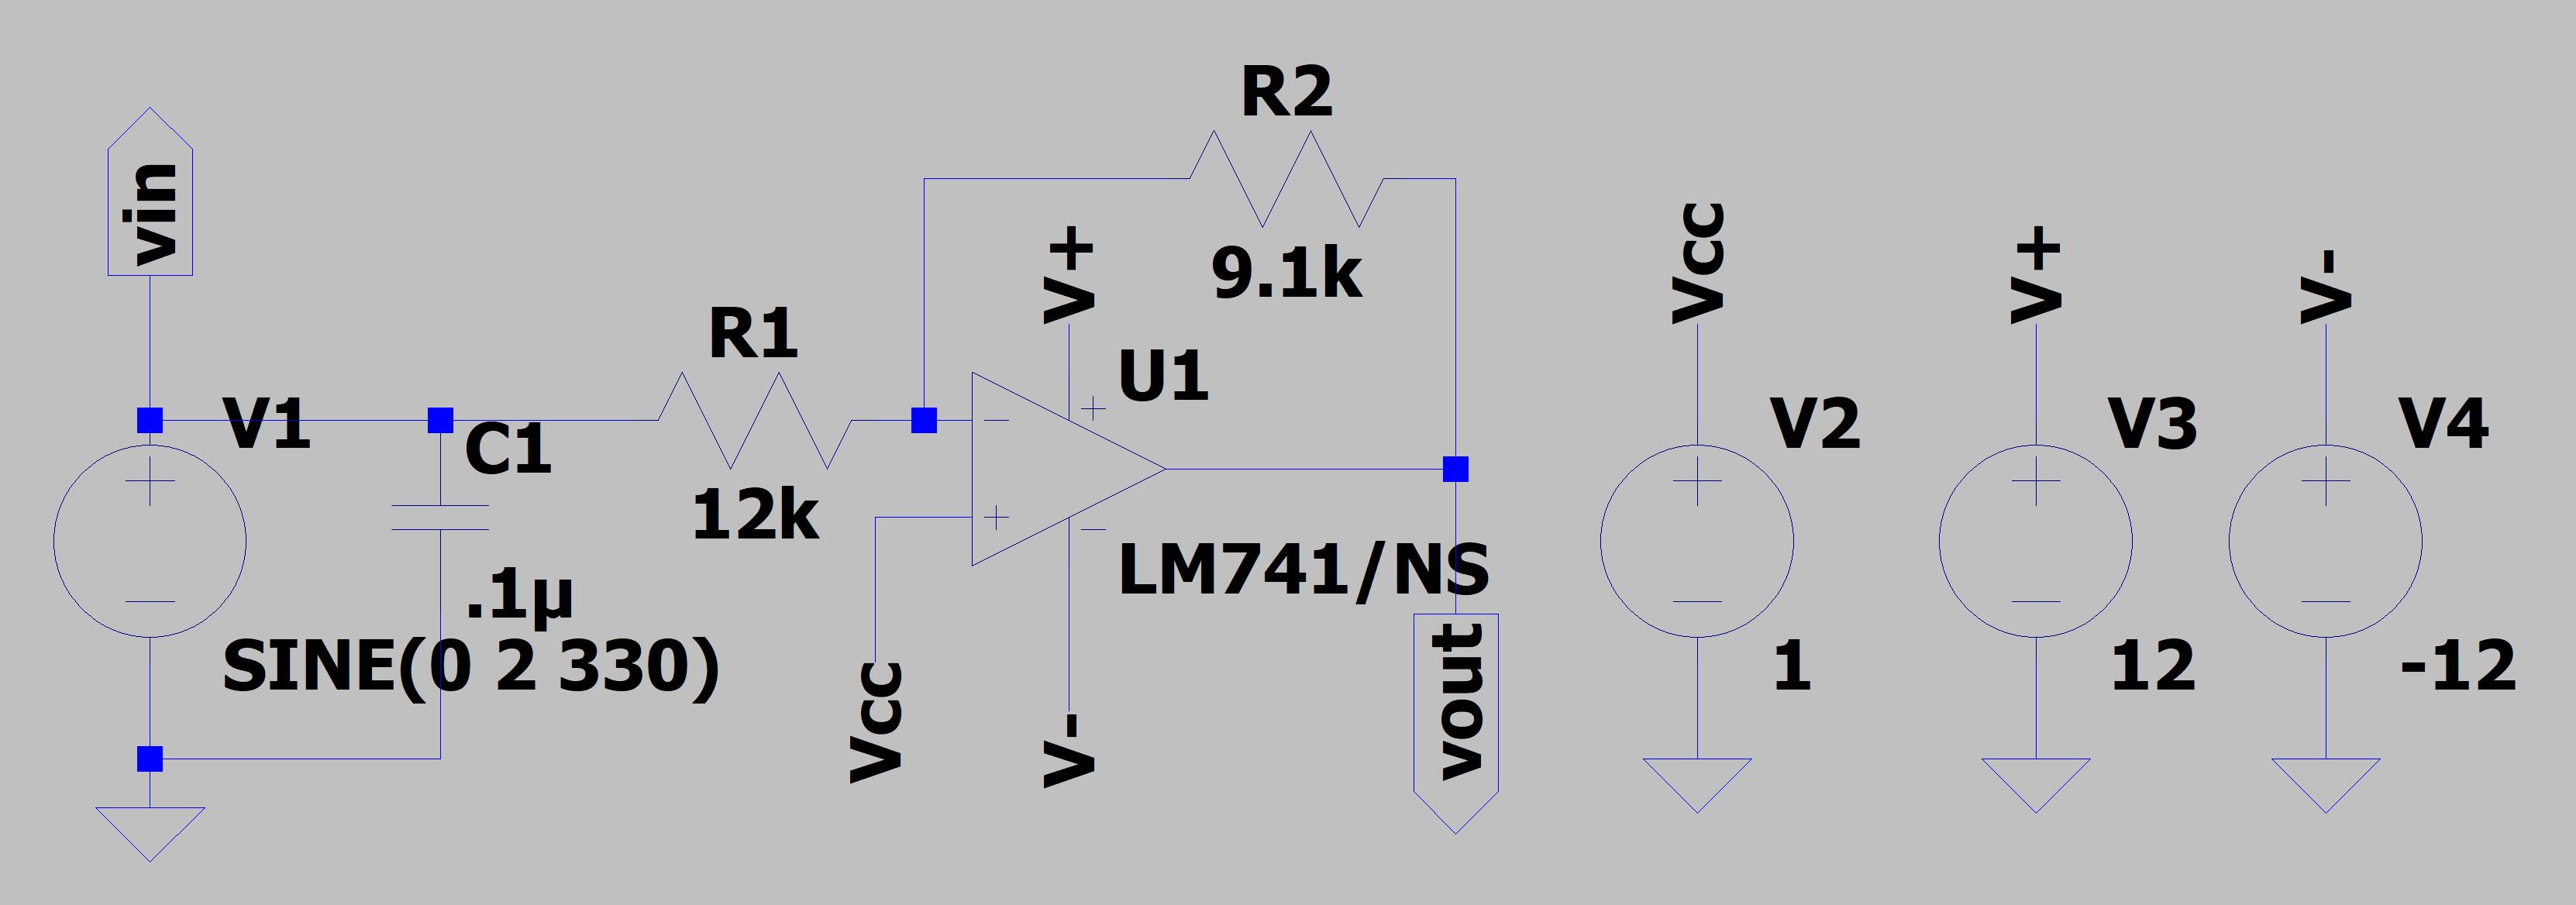 Gands schematic n3ku4uflwu